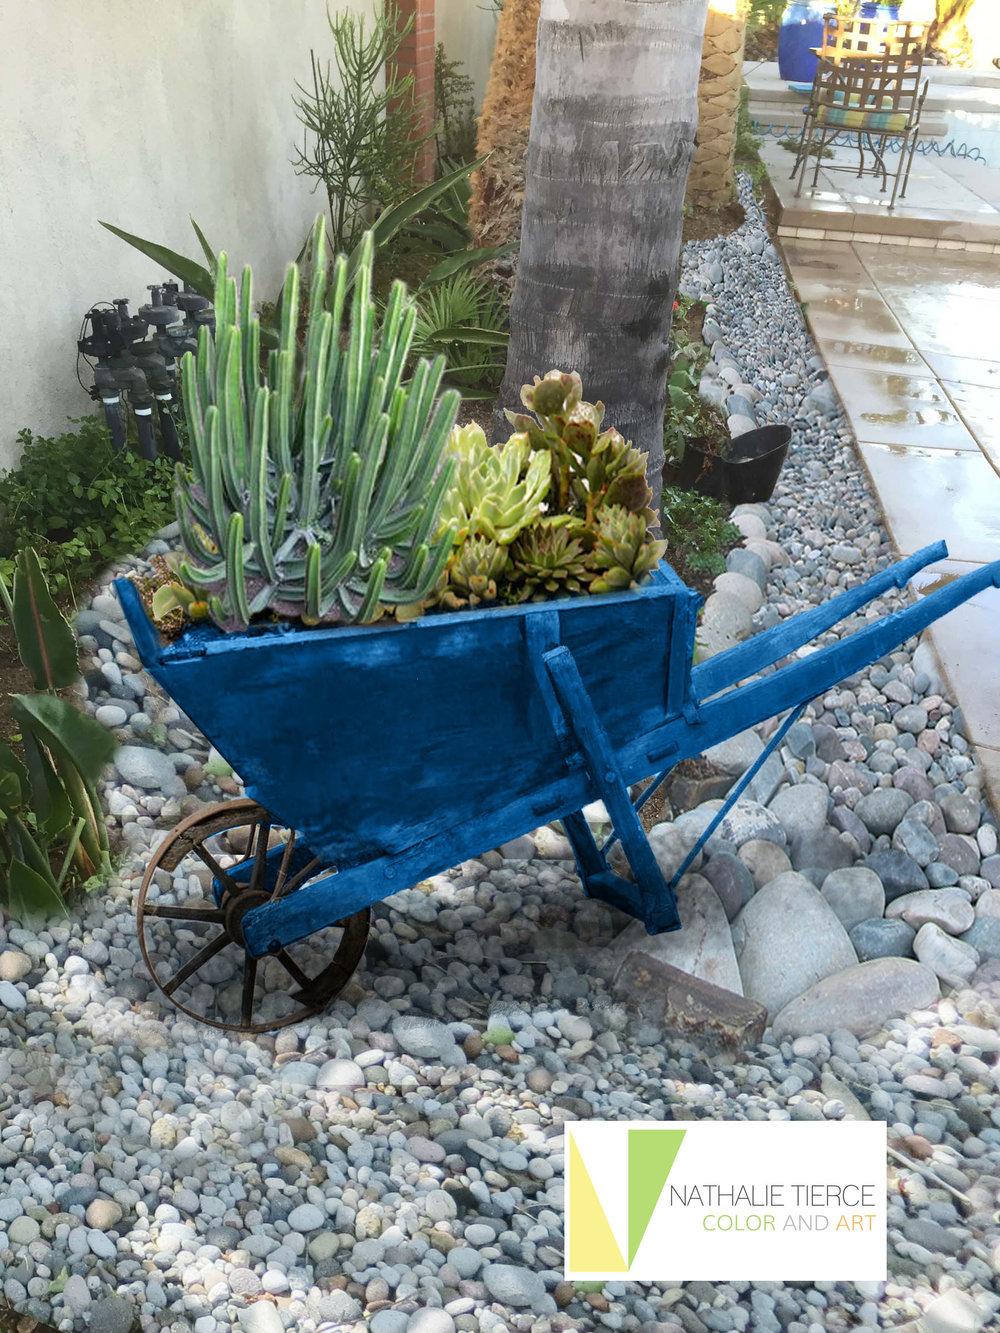 carol poolside wheelbarrow_b new logo.jpg